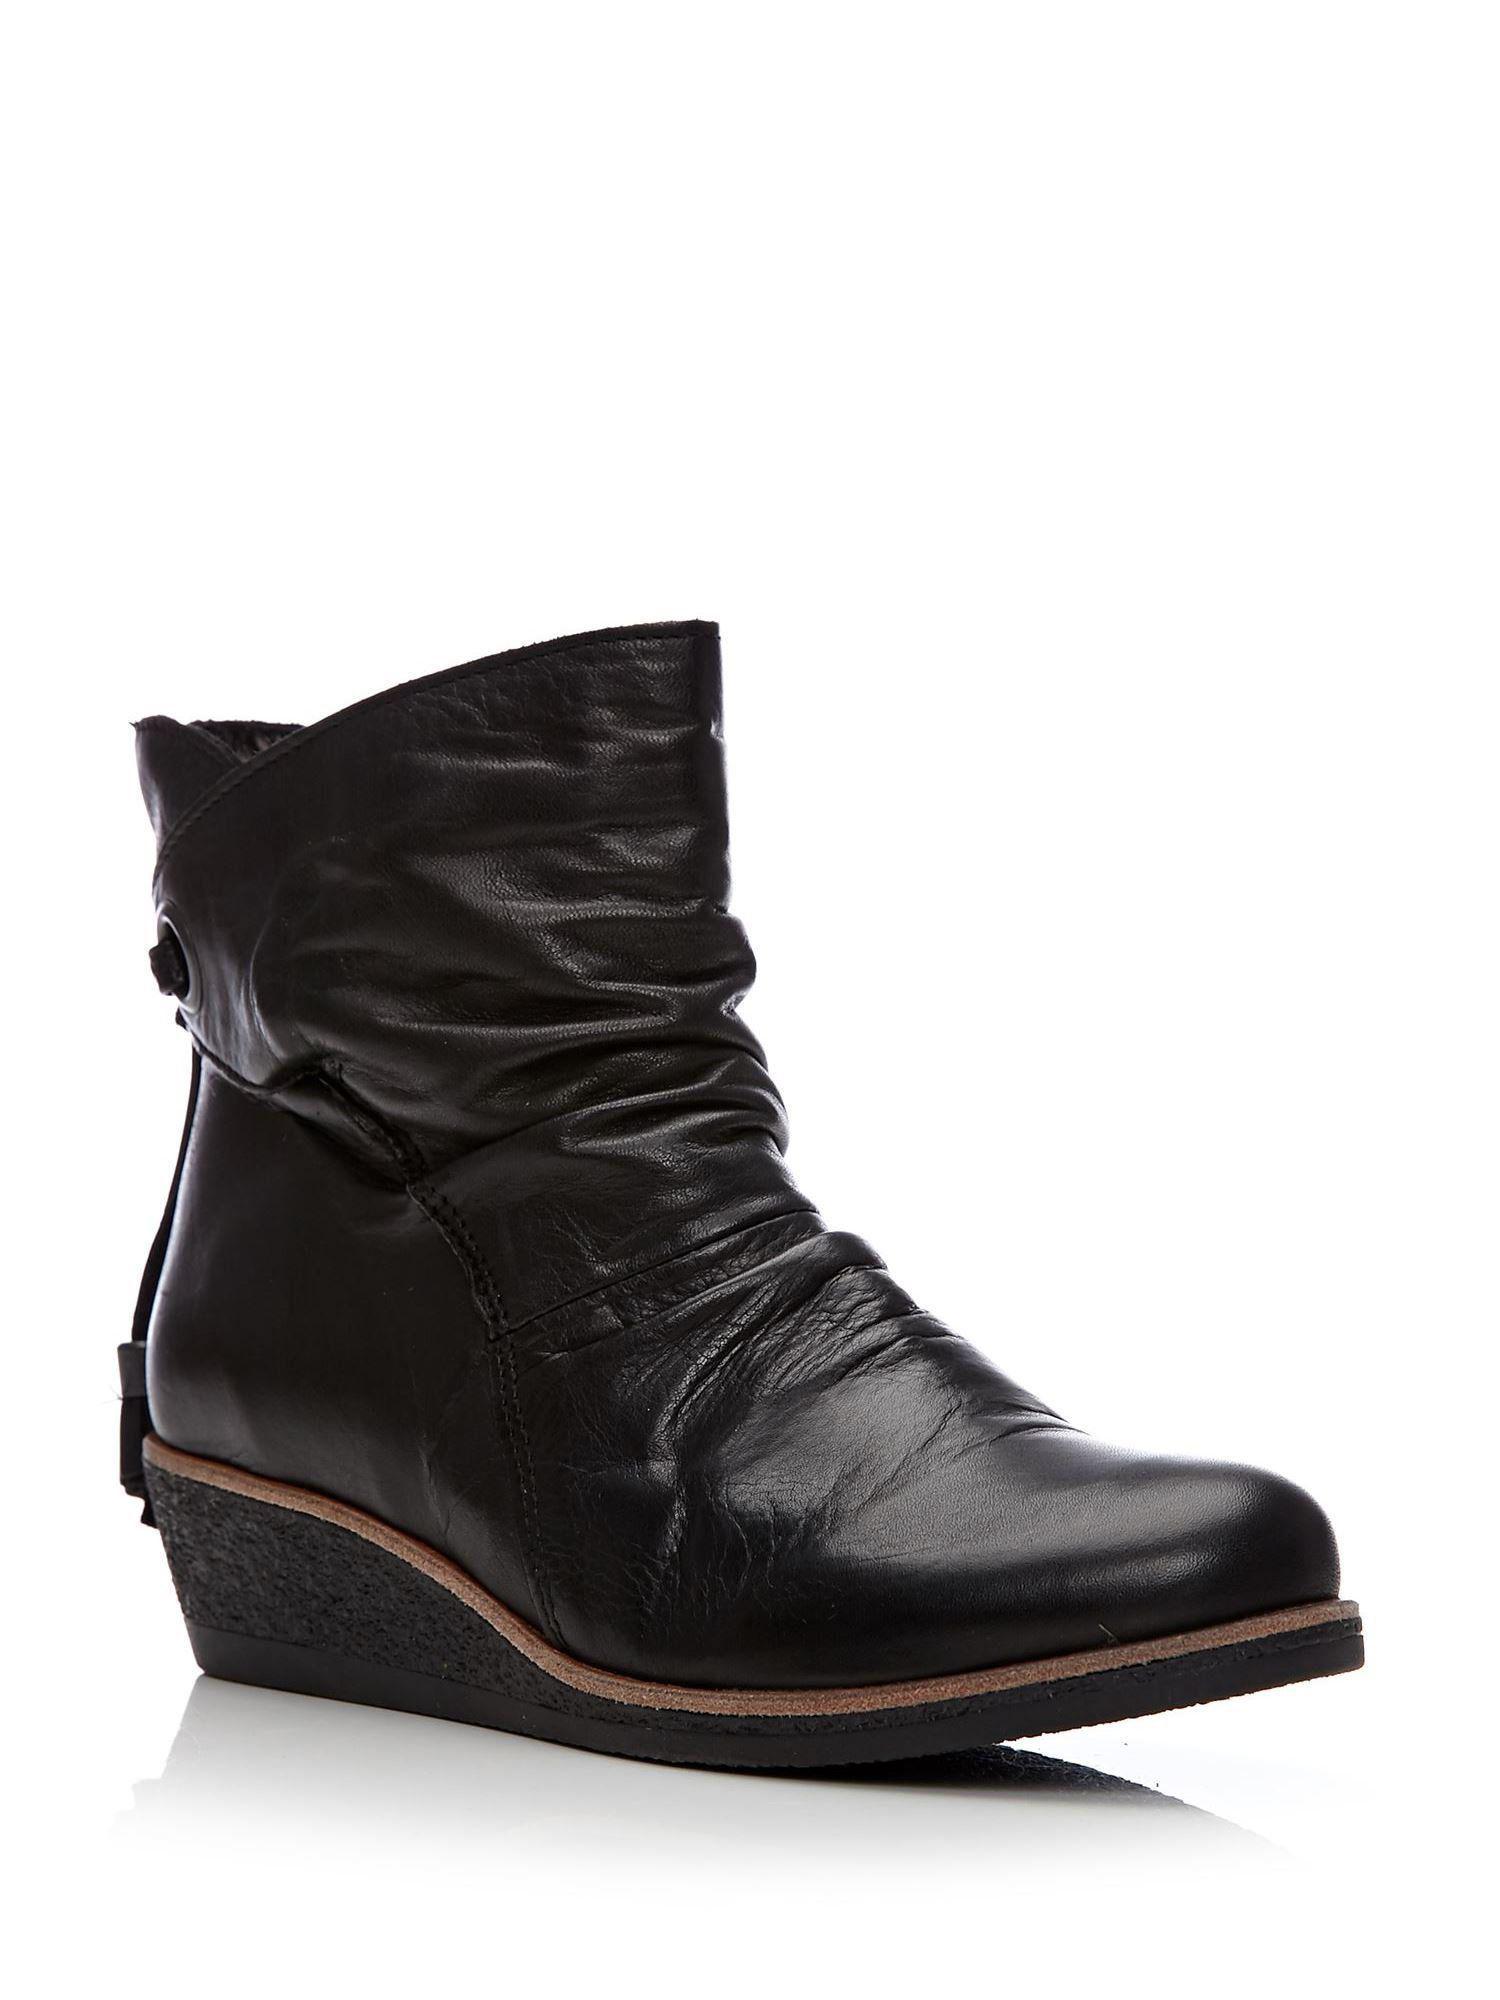 dd4d99c6d14 Moda In Pelle Adoni Low Casual Short Boots in Black - Lyst